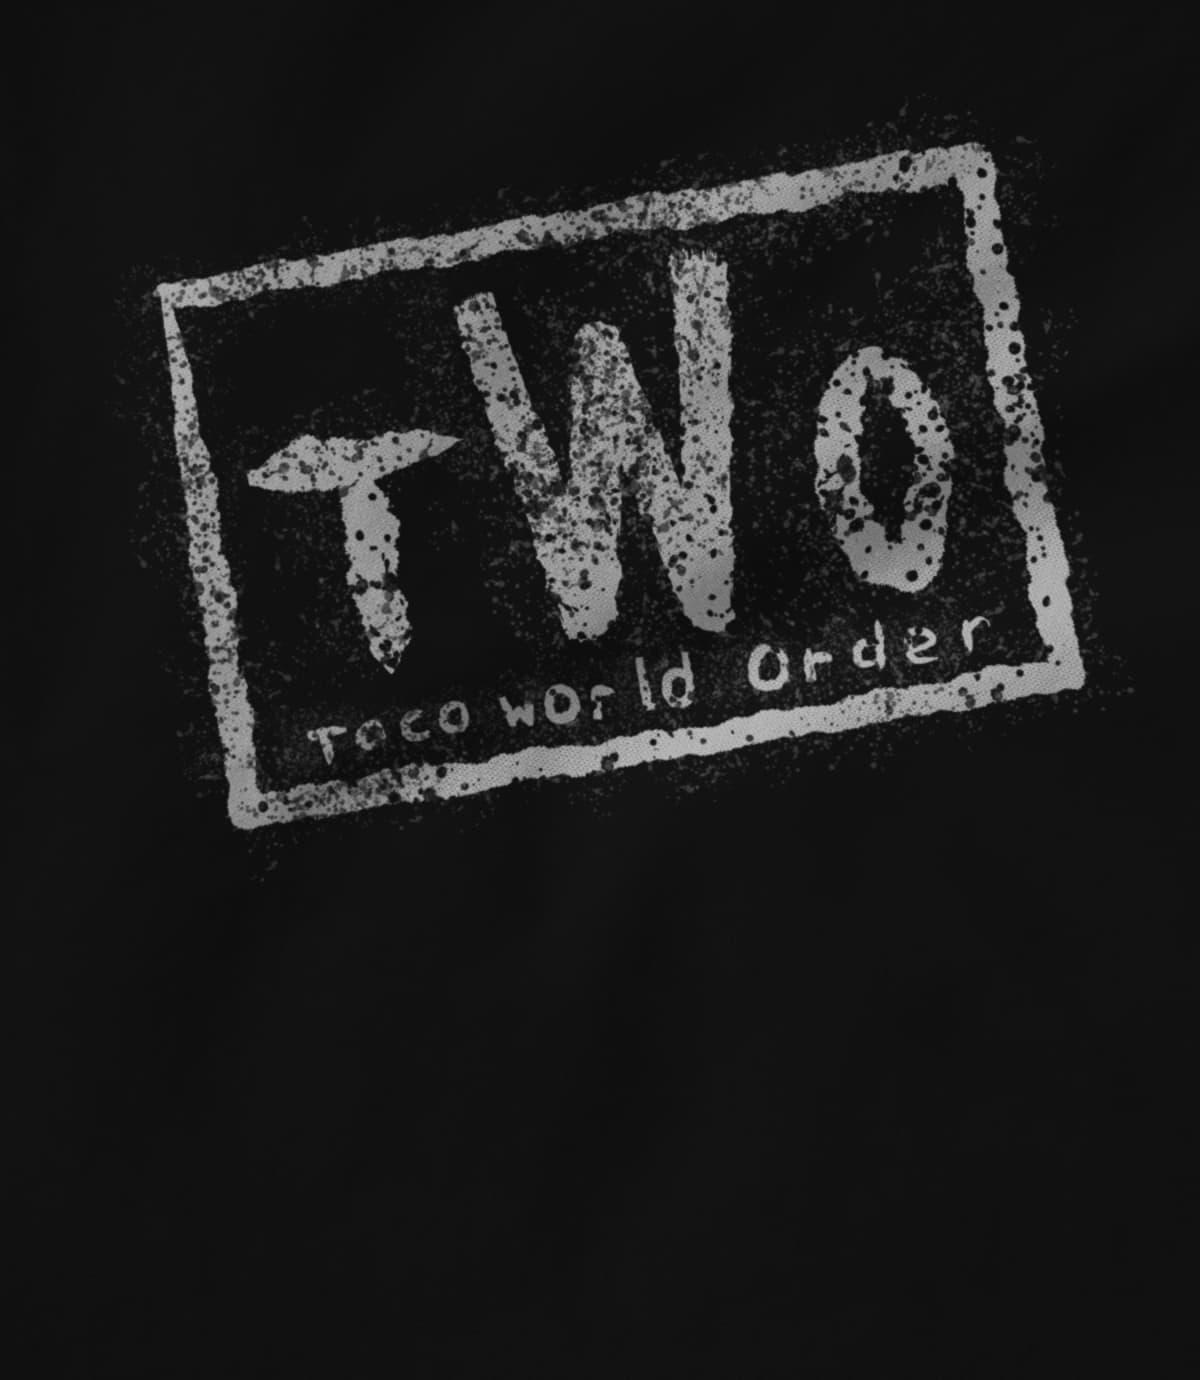 Tacostabber taco world order 1597649660